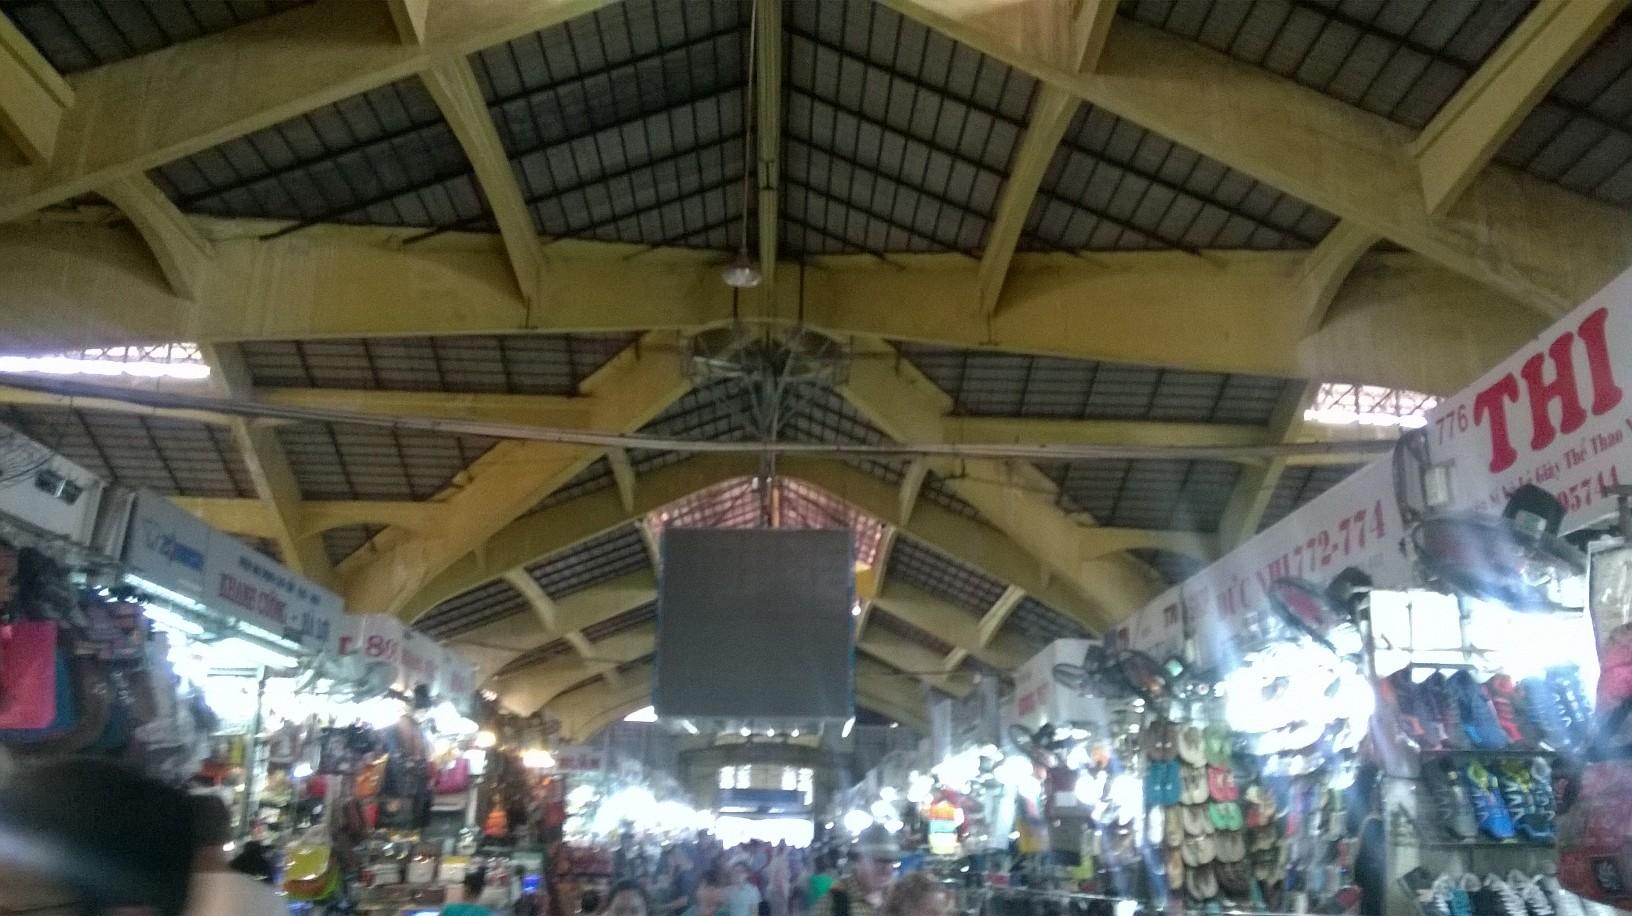 hcmc-ben-thanh-market-aisles-to-cua-side-mar16